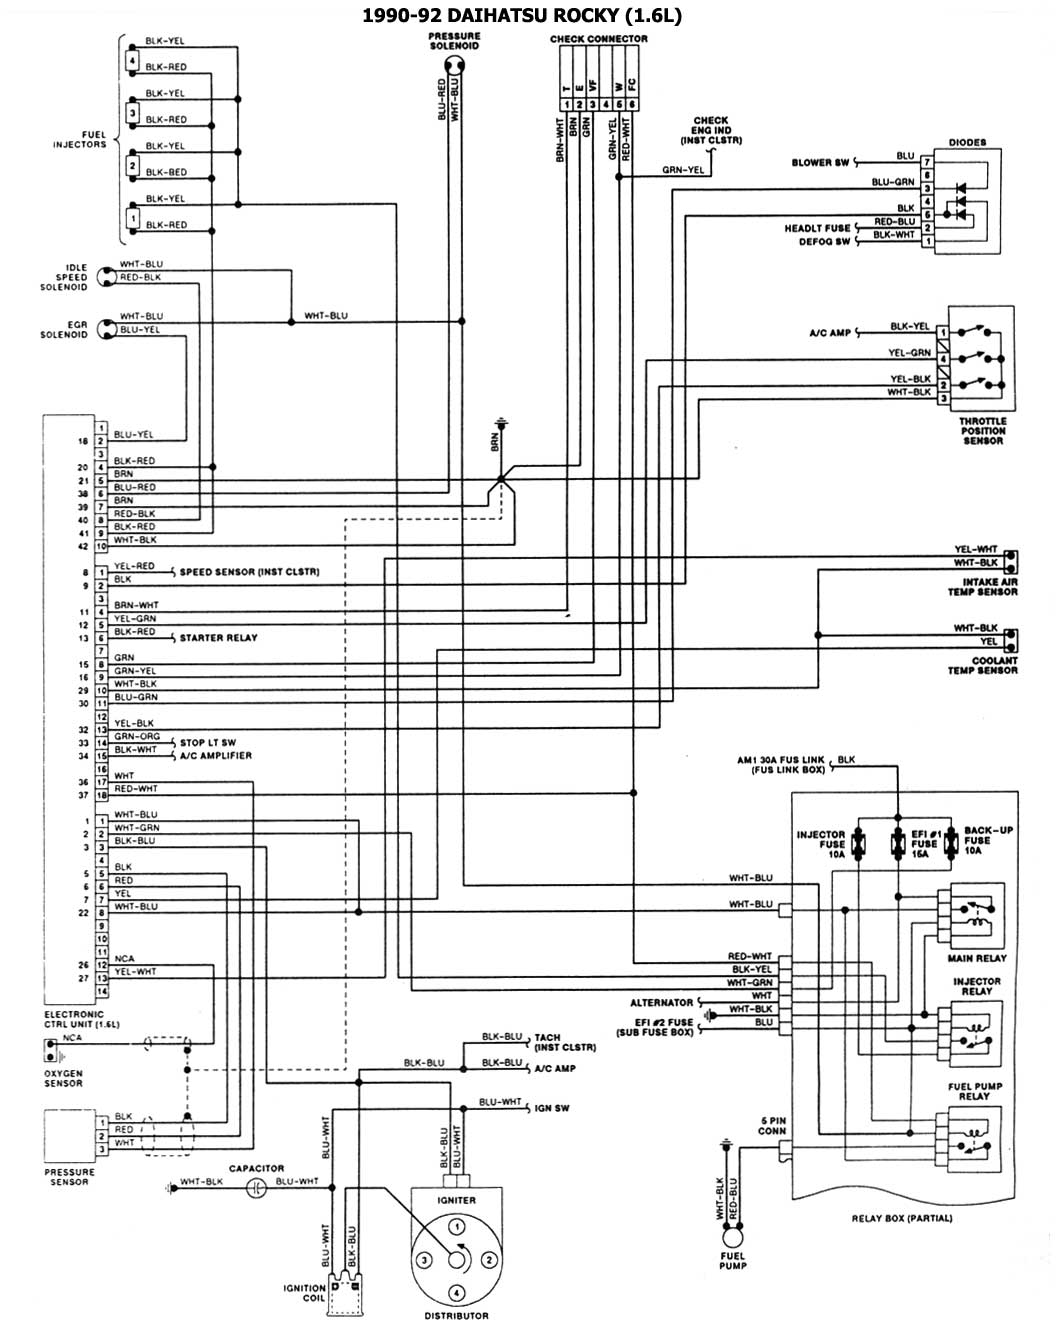 Daihatsu Applause Wiring Diagram Real Eps Engine Atlantic Metering Diagrams 1800cc